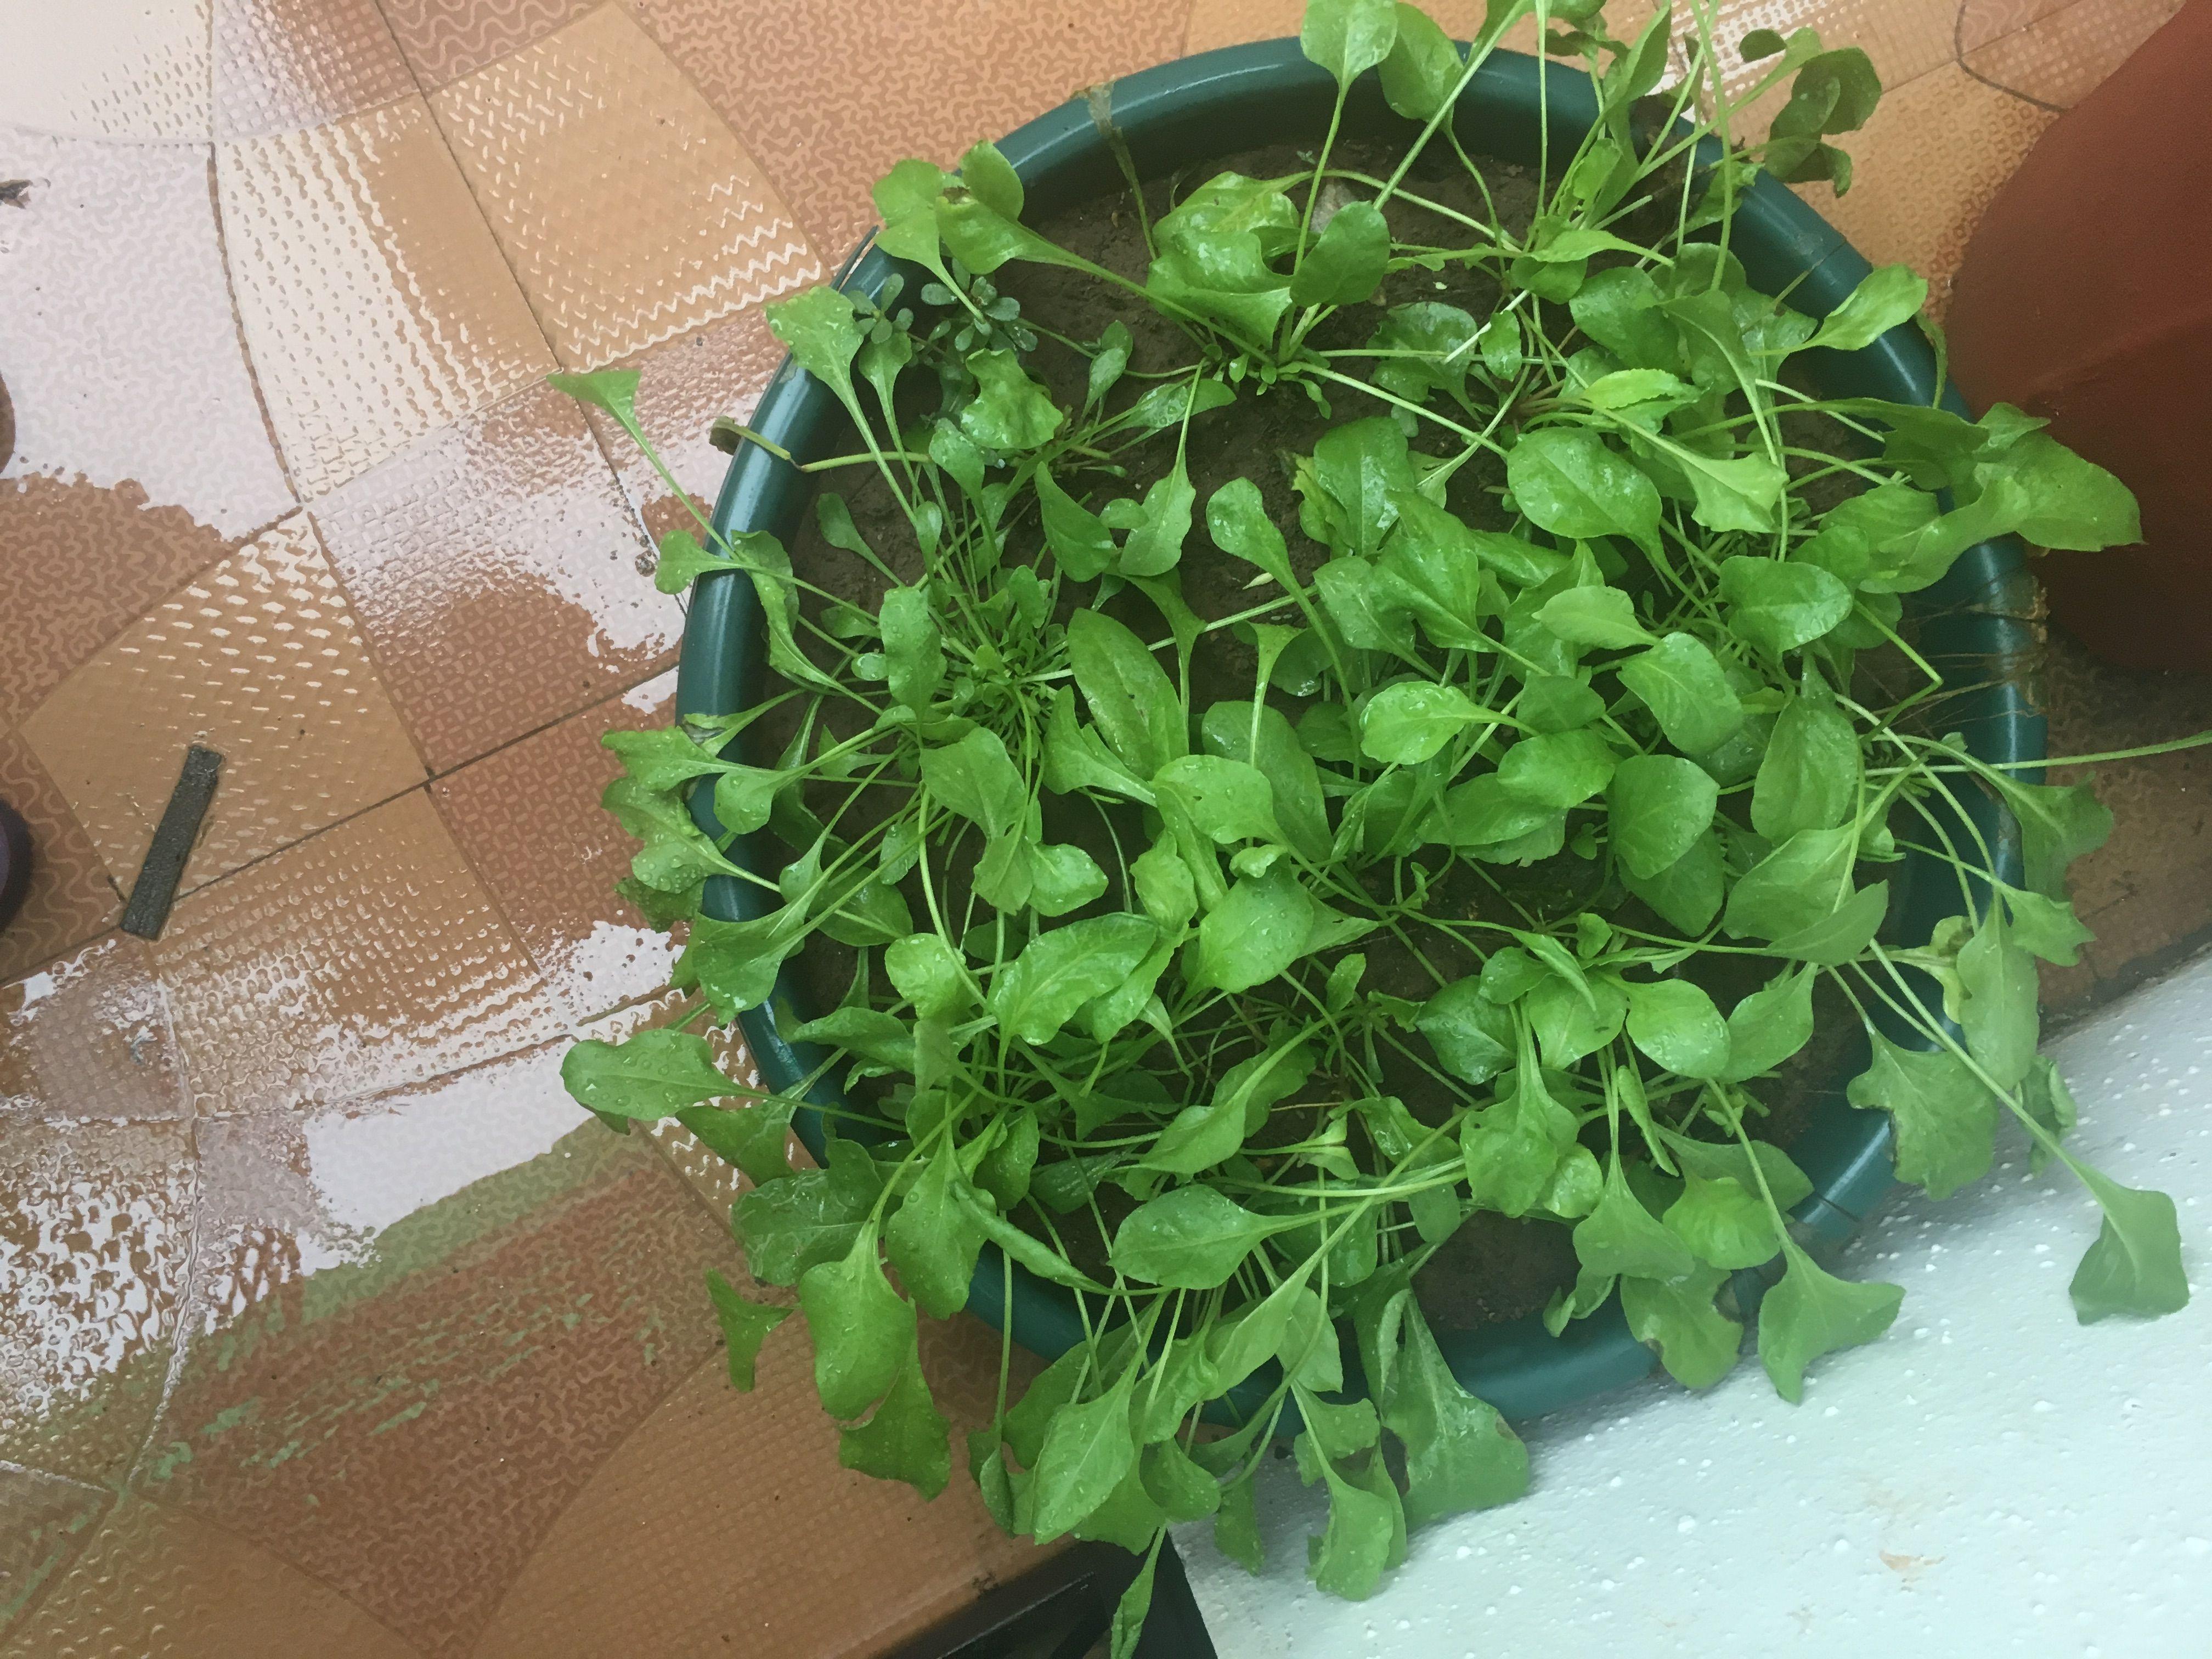 My Mini Spinach farm